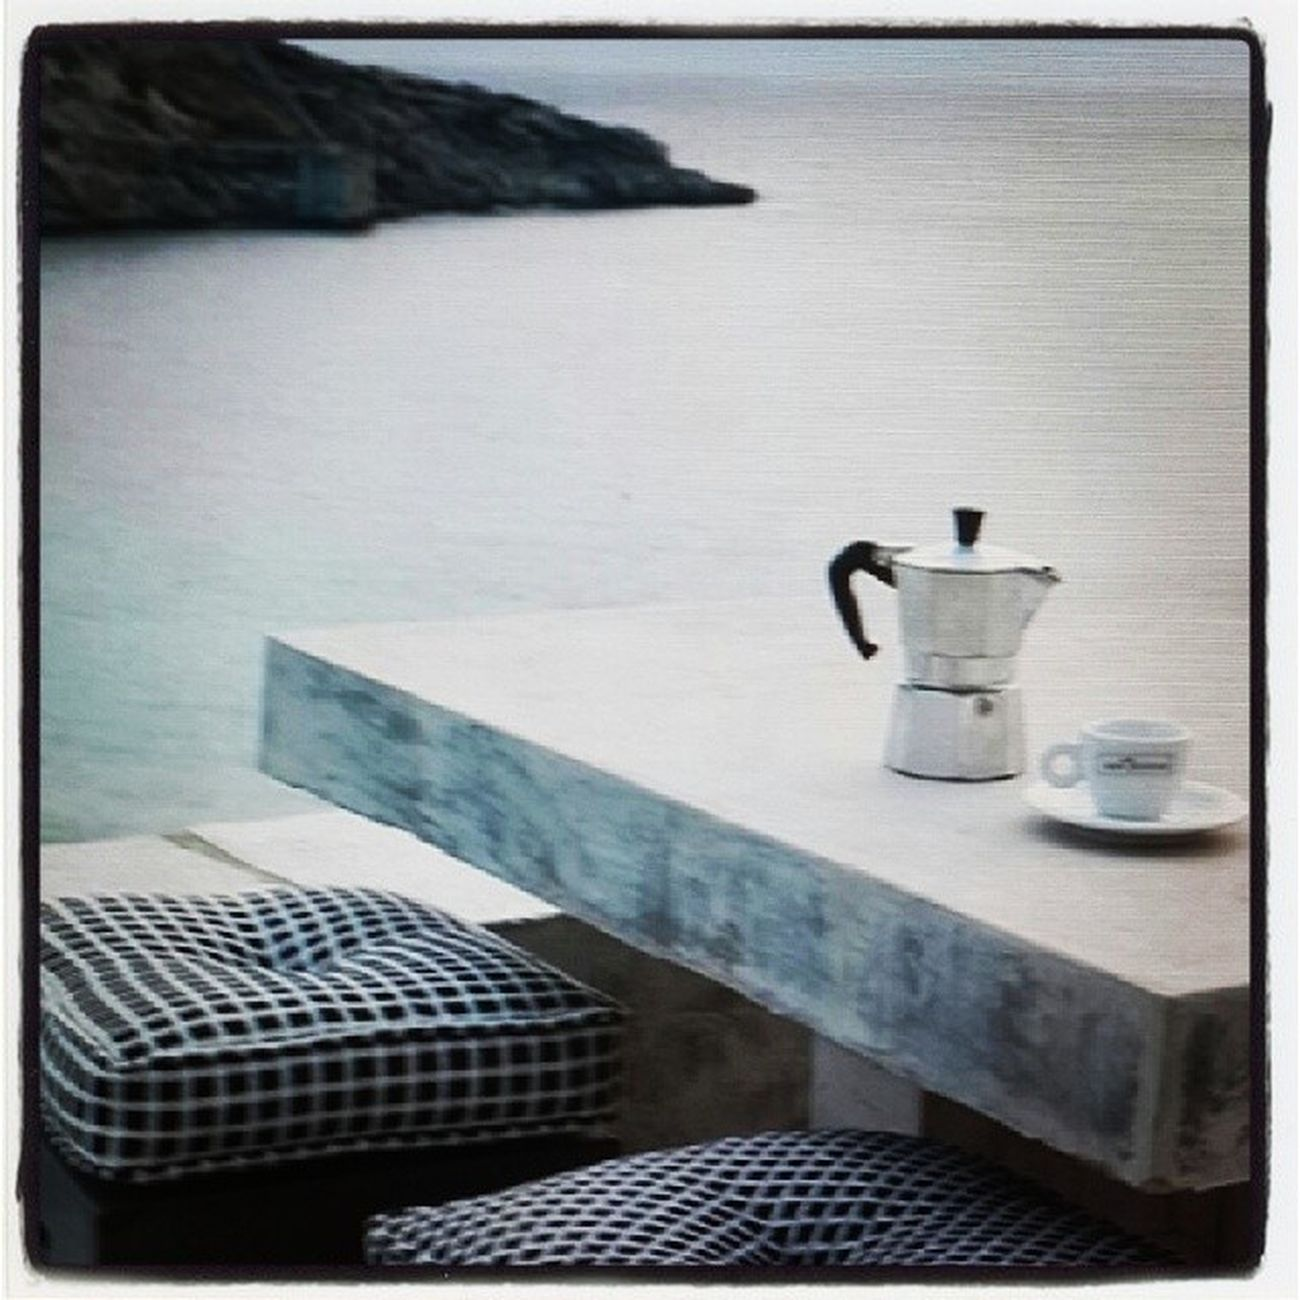 Dégustez son café face à la mer ! Cafesbenyedder Cafegramers PauseCafe Insta9hiwa instacafe instagood instamood photoftheday yummy café moka